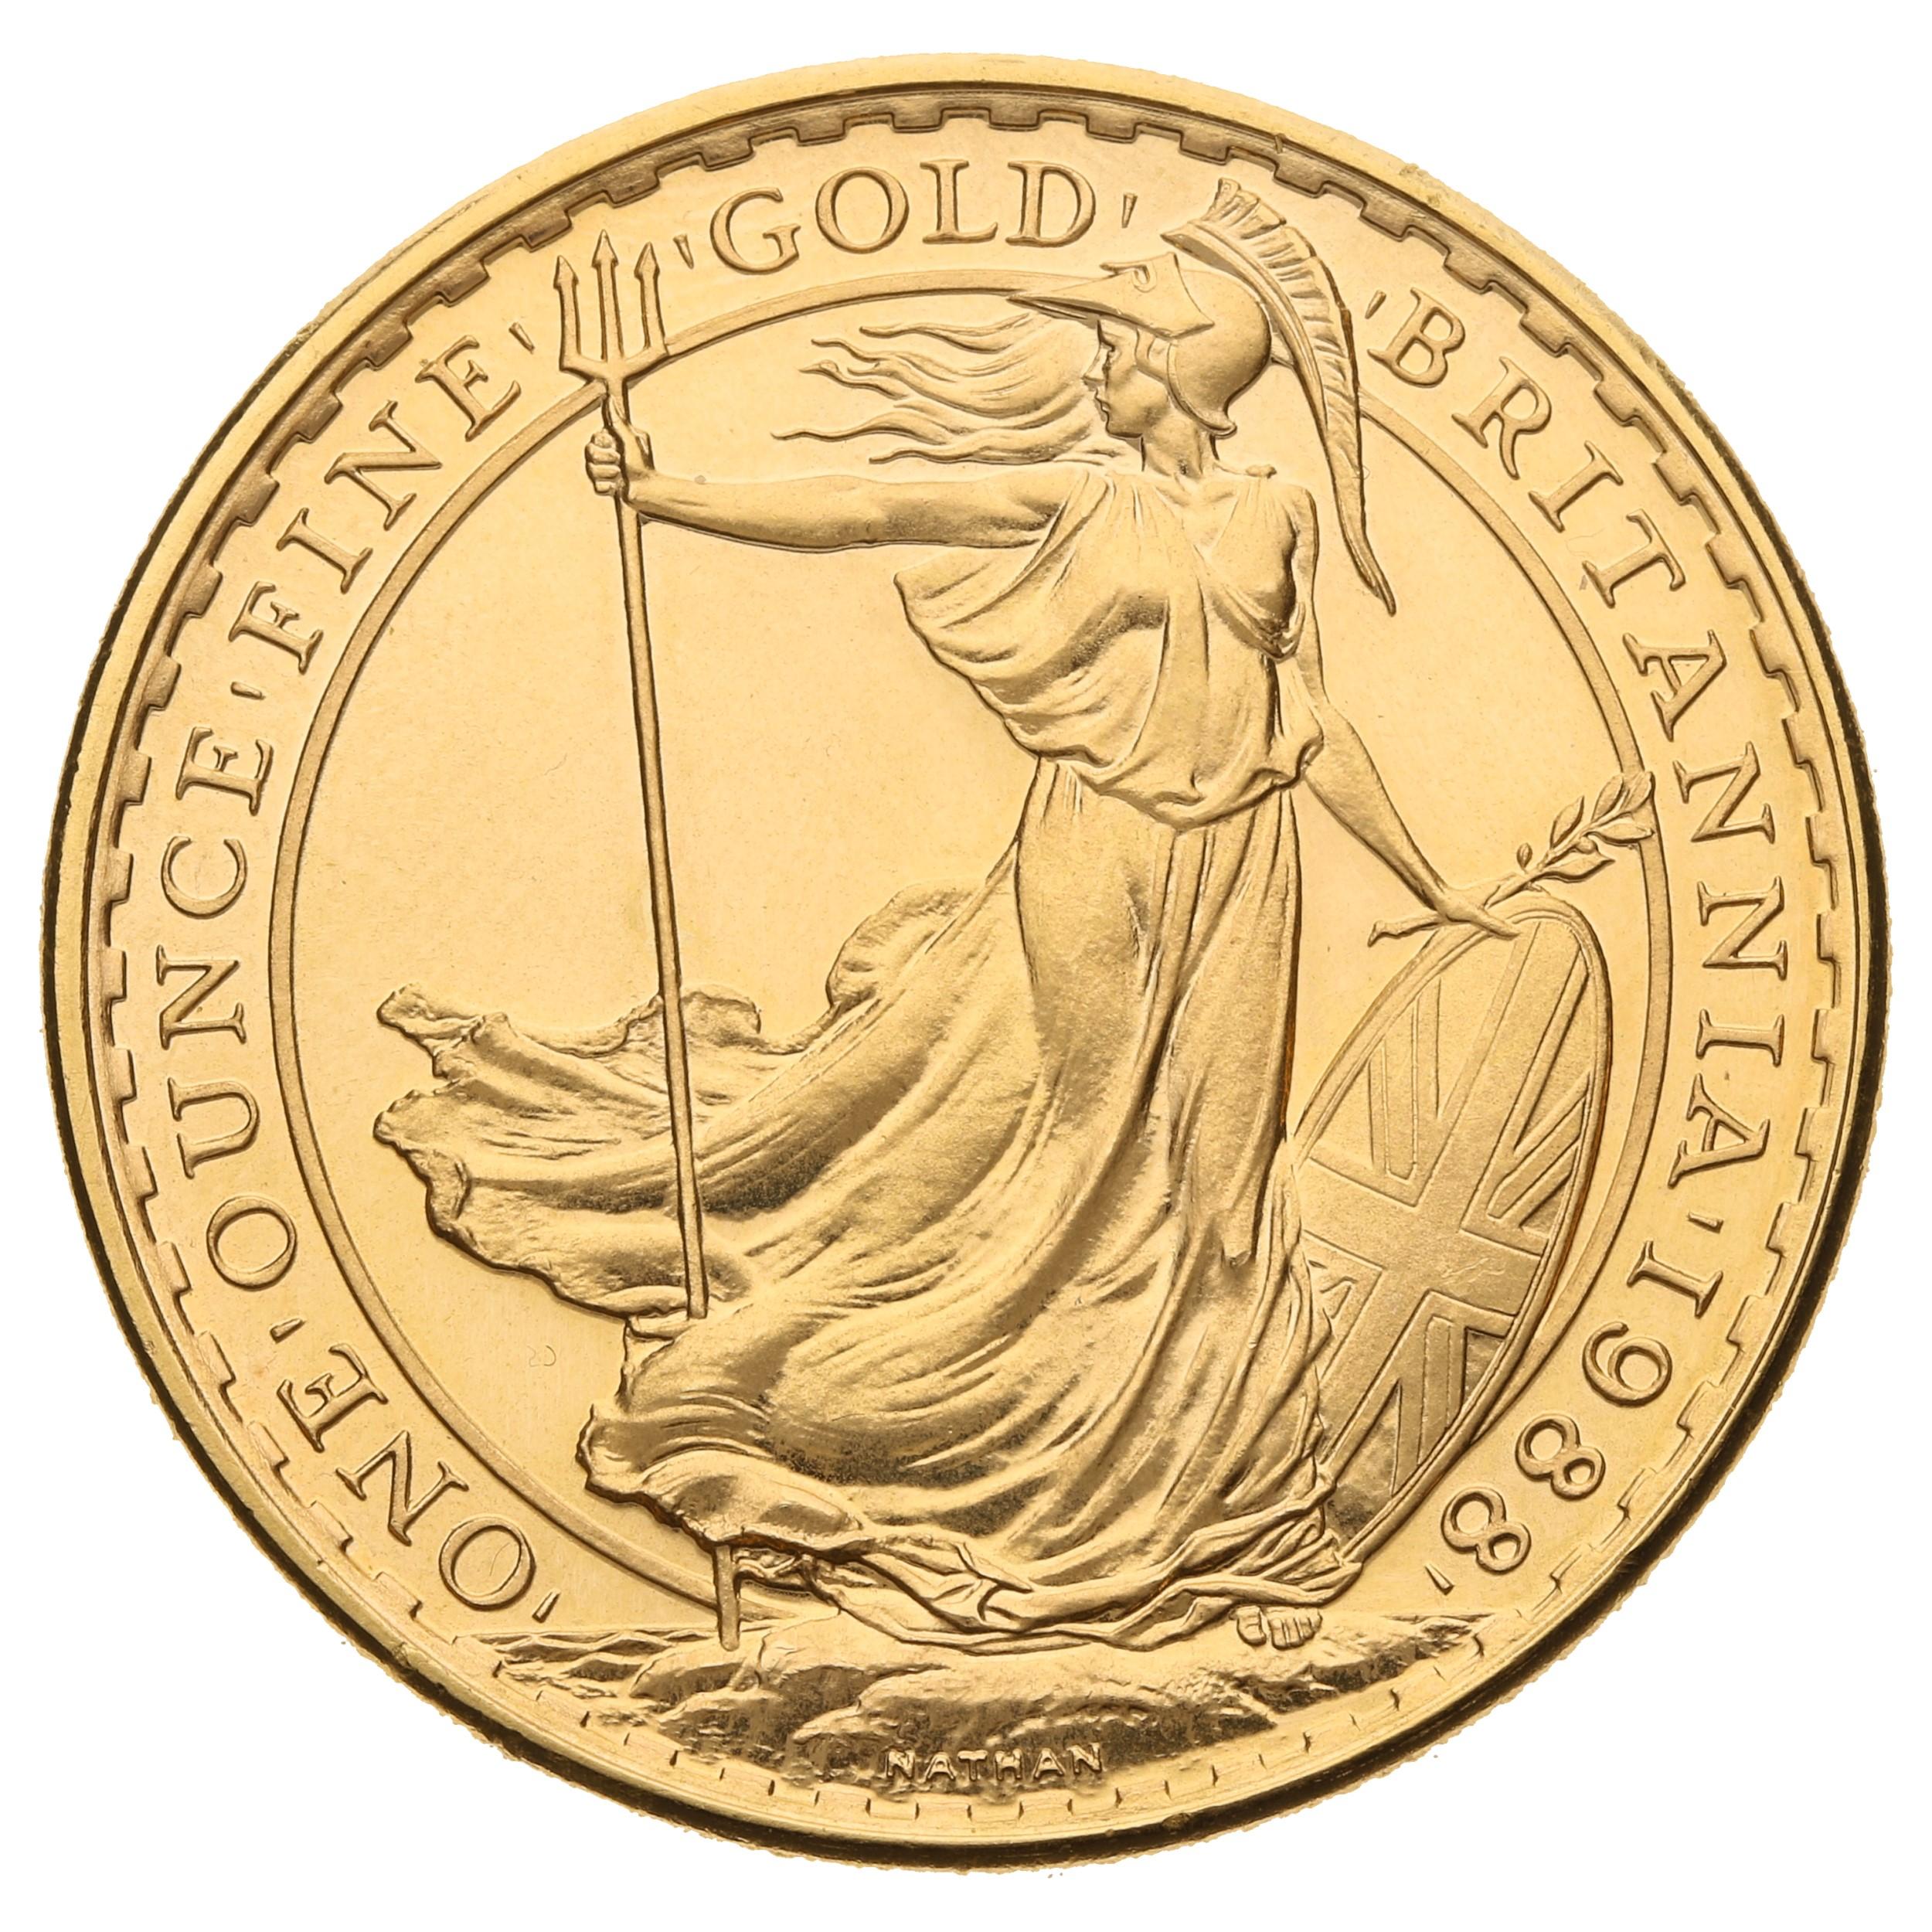 1988 Gold Britannia One Ounce Coin